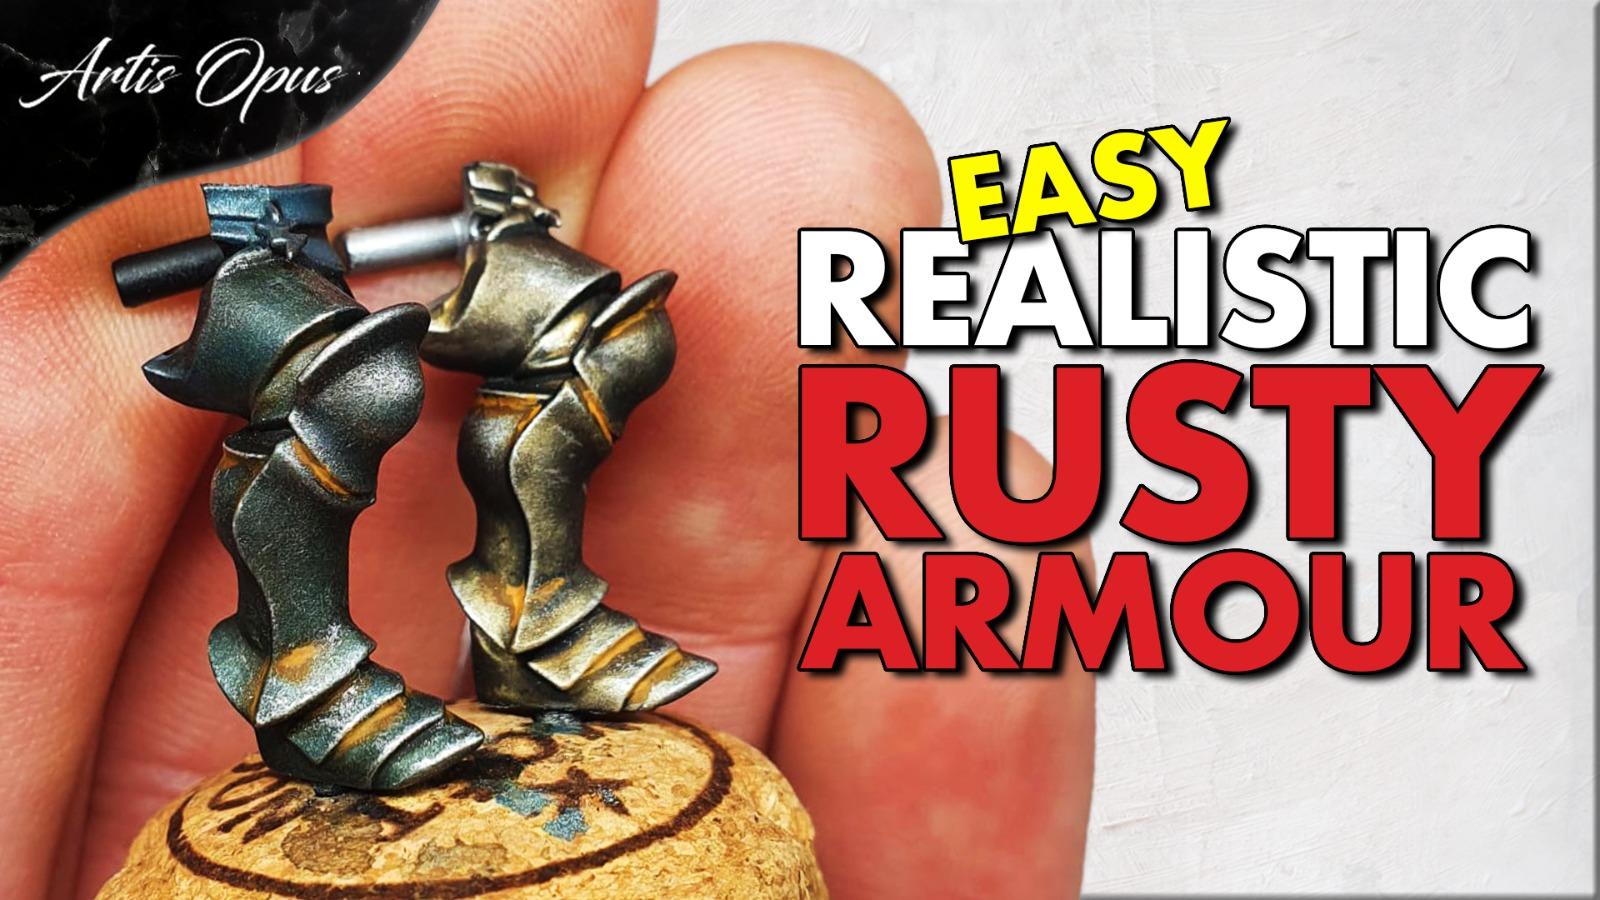 Artis Opus Rusty Armour Bundle